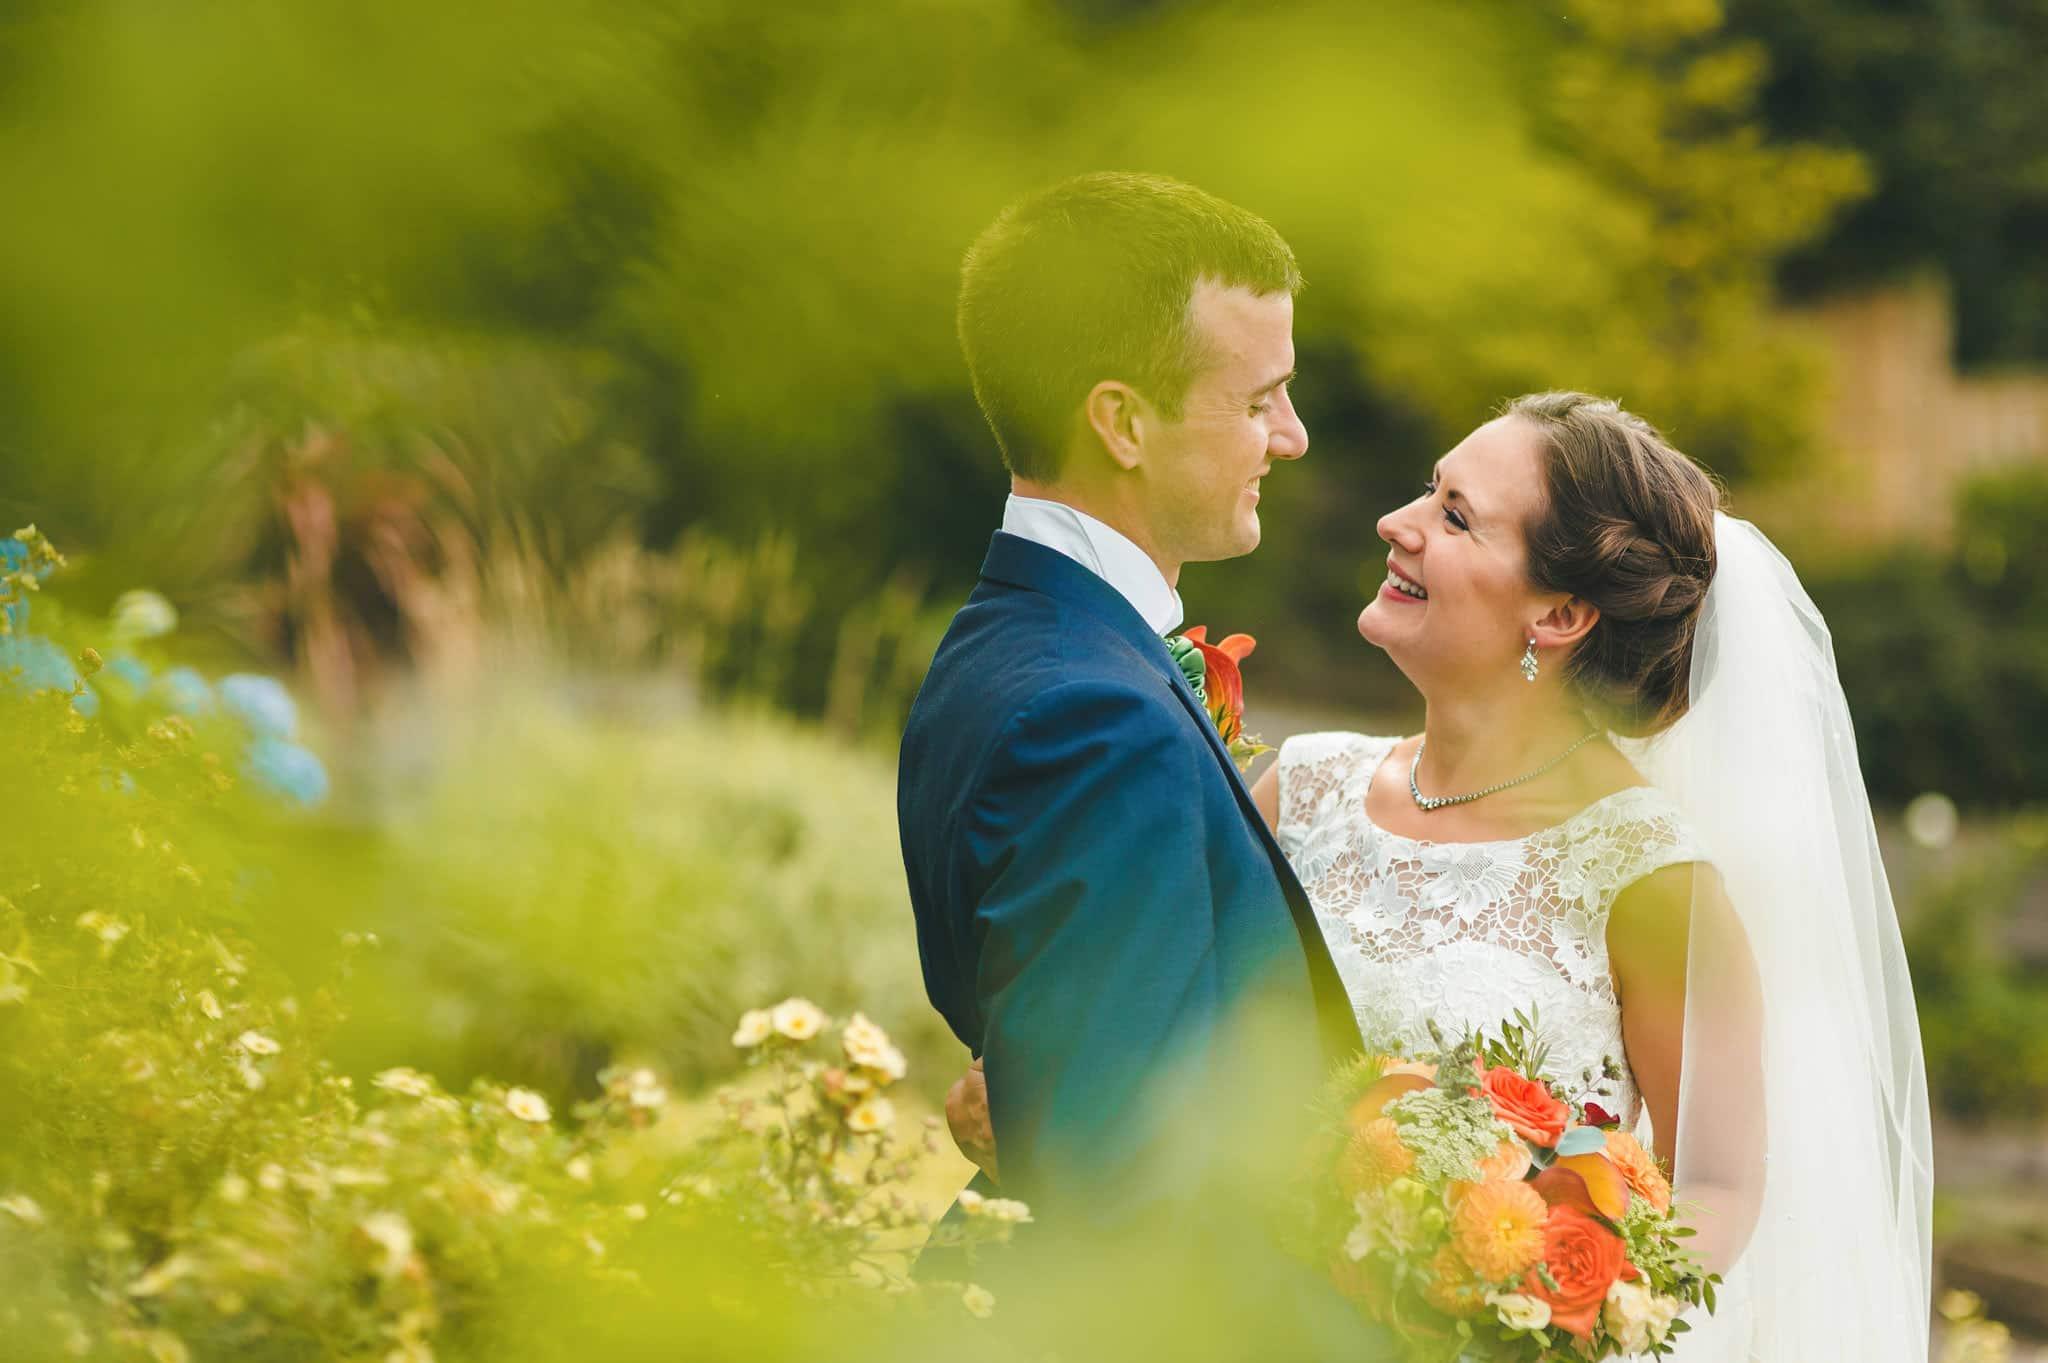 wedding-photography-at-y-talbot-hotel-in-tregaron-wales